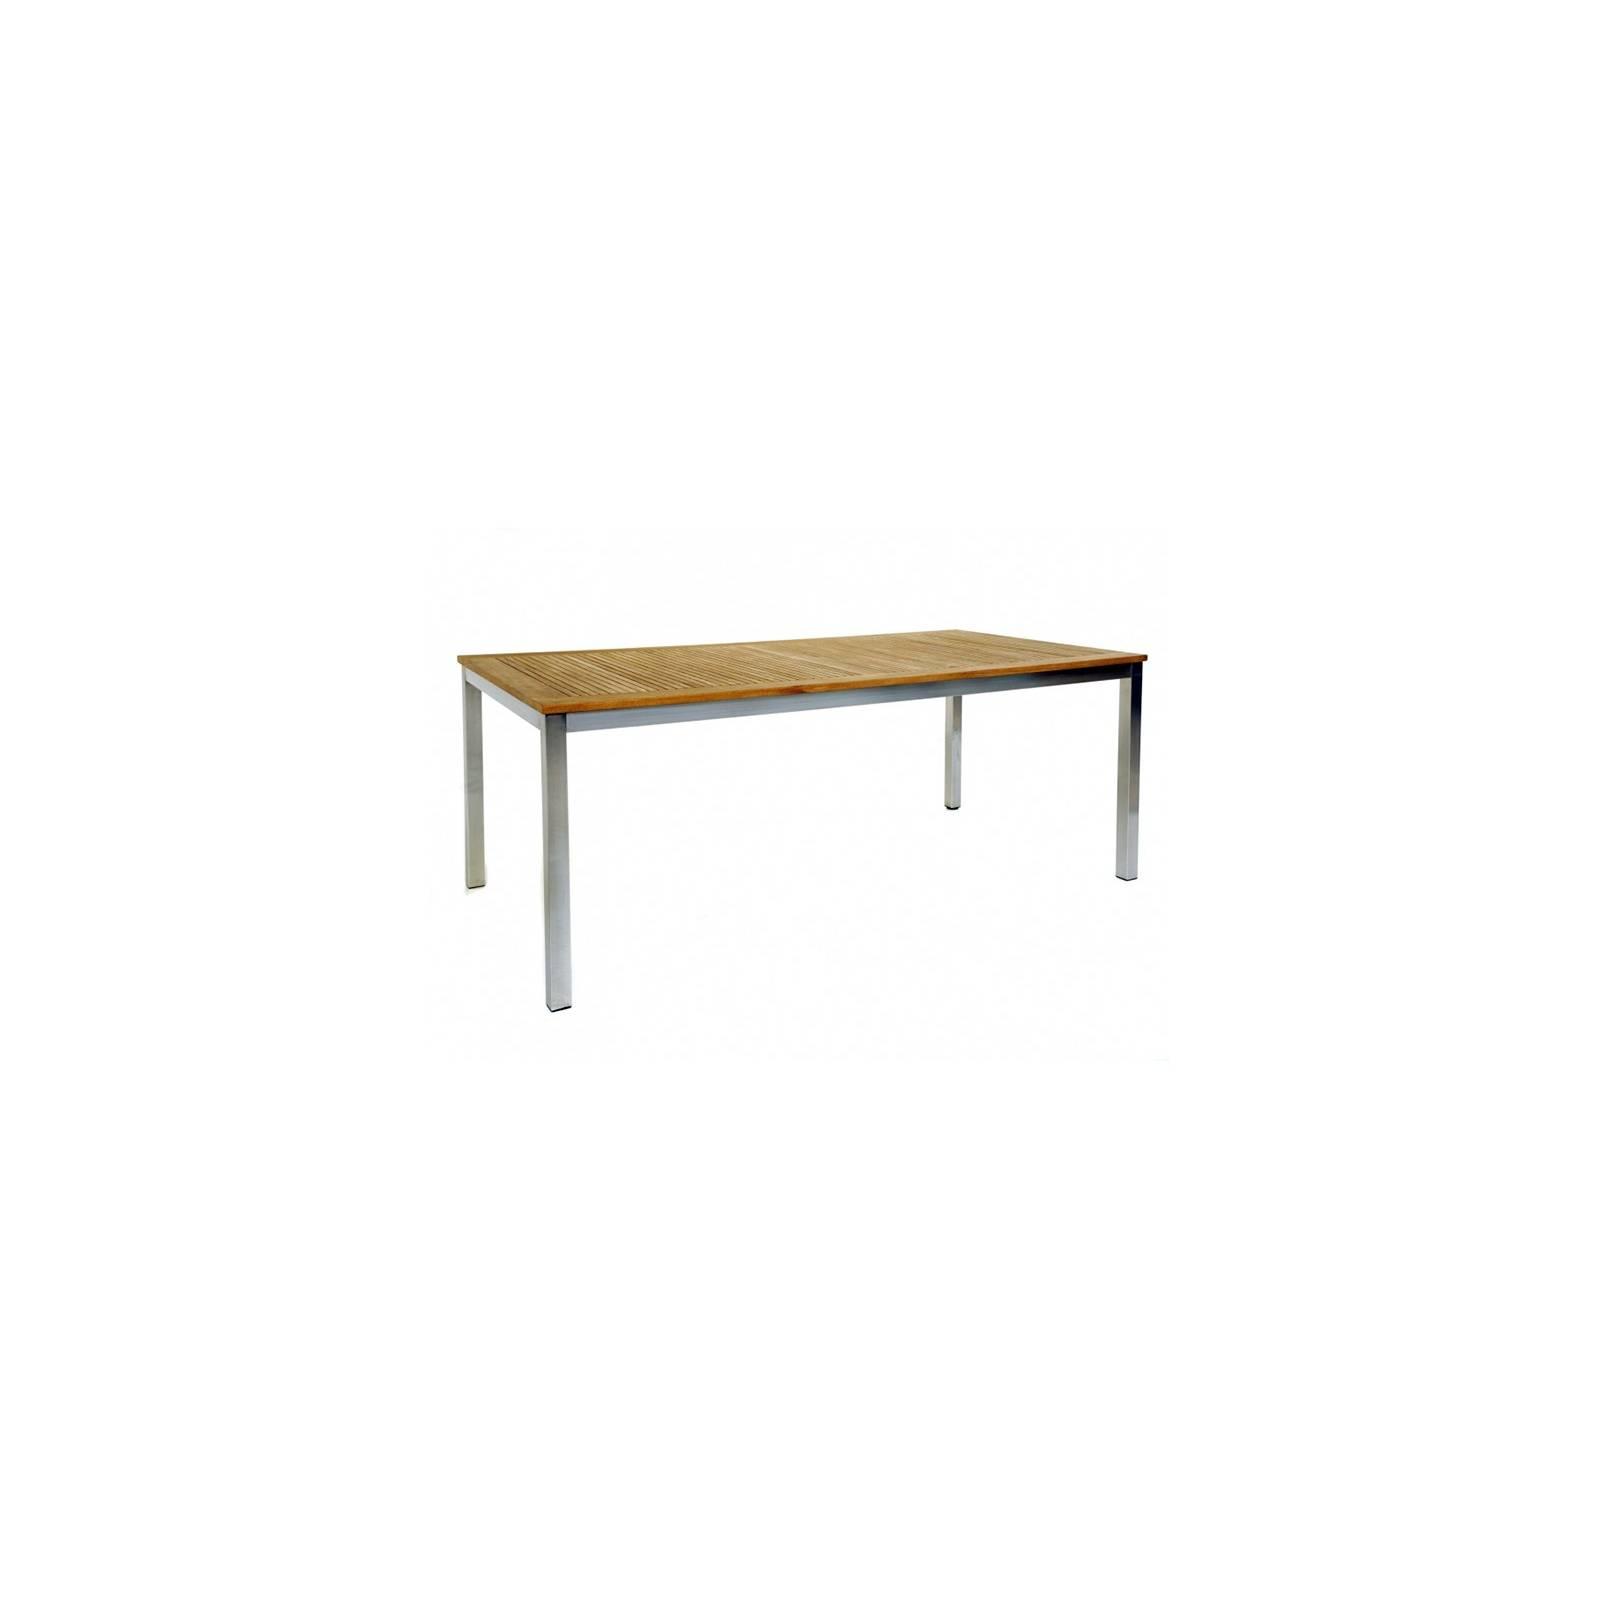 Table De Jardin Taman Teck Recyclé